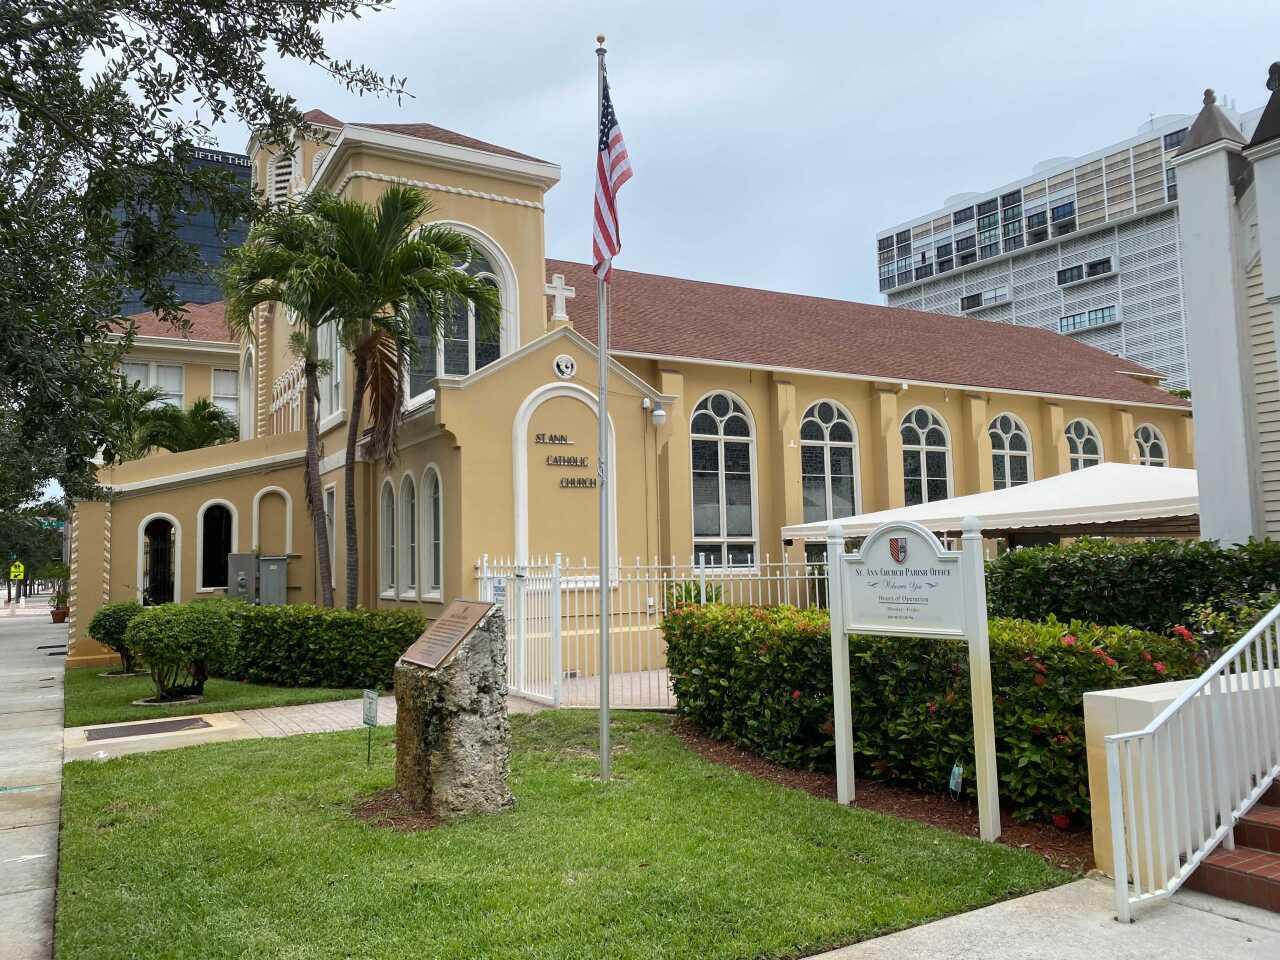 St. Ann Catholic Church and parish office